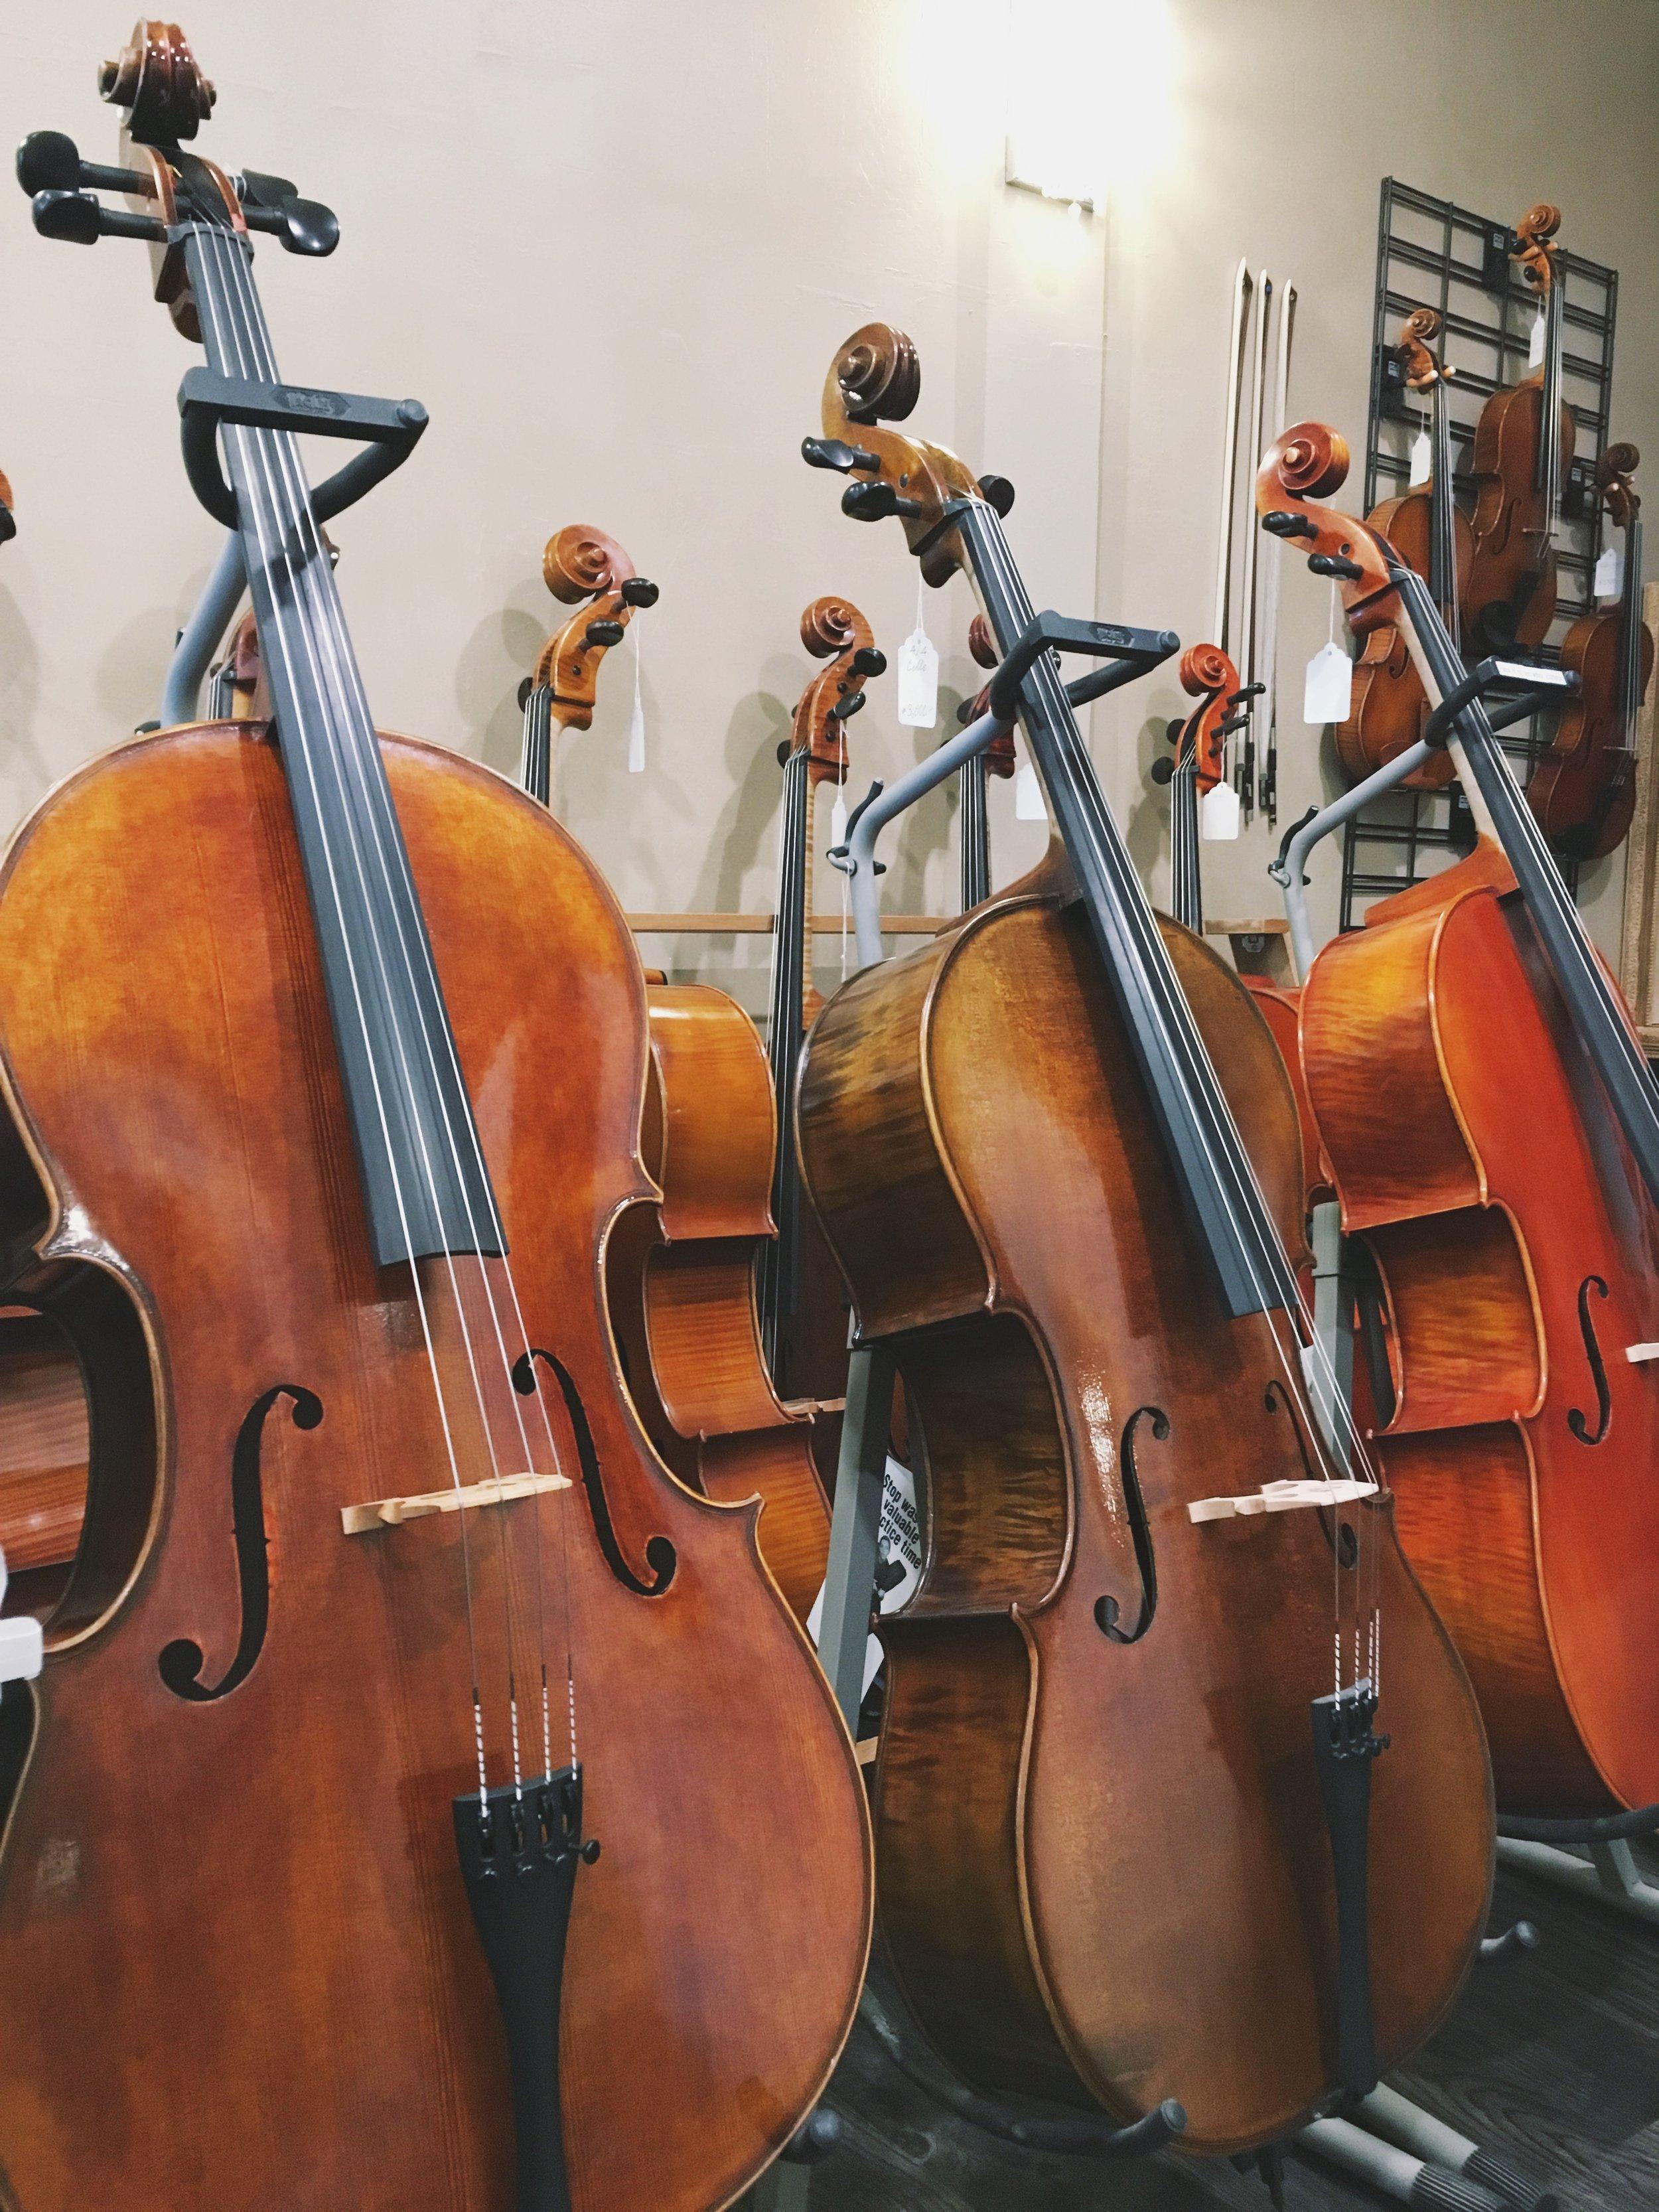 Cellos in the Violin Shop of Old Carmel. Carmel, Indiana.